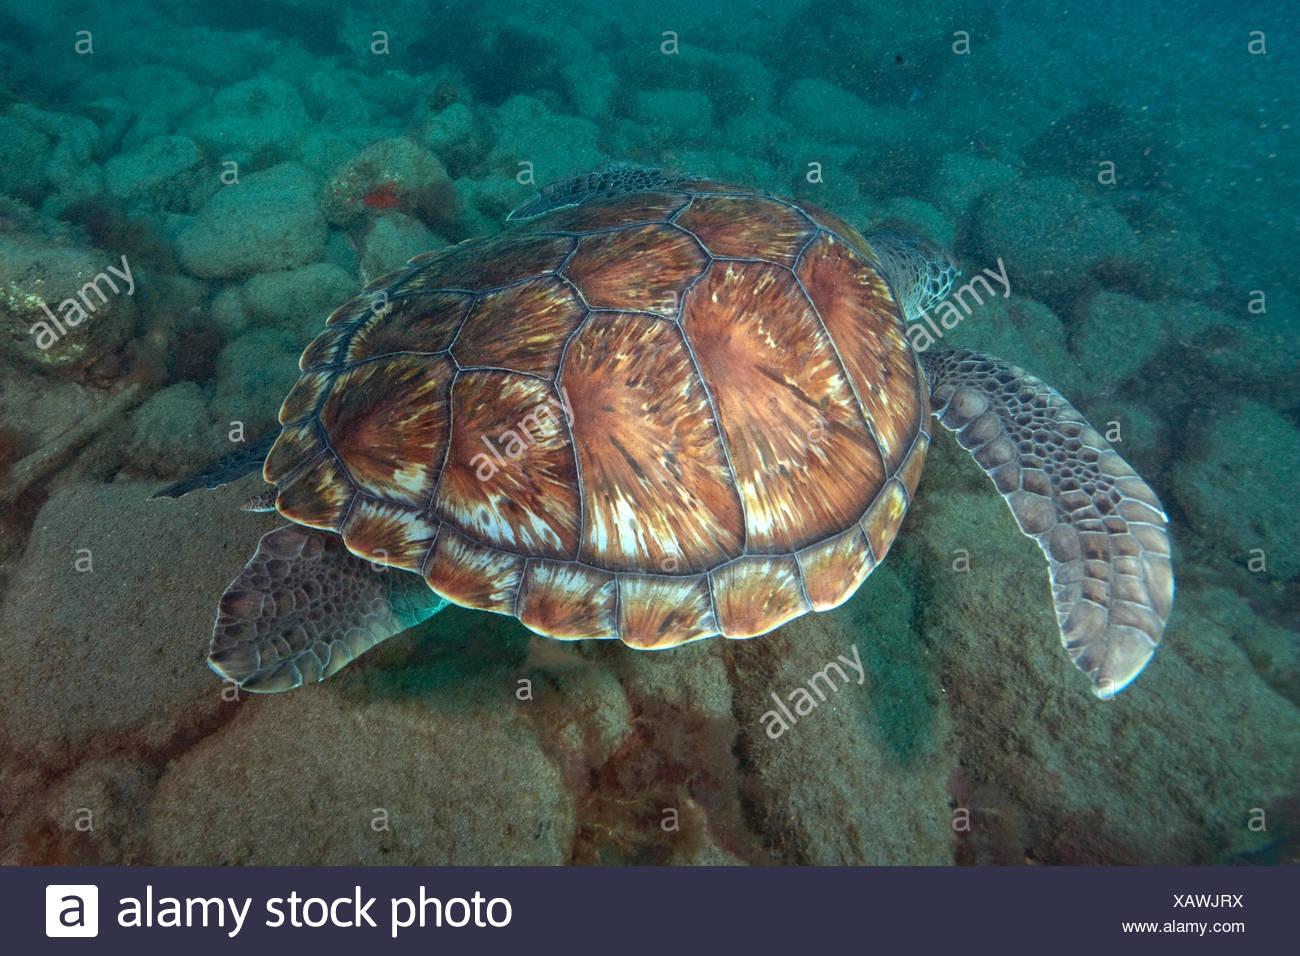 echte Karettschildkröte, Kanarische Inseln, Spanien, Europa, Atlantik / (Eretmochelys Imbricata) Stockbild